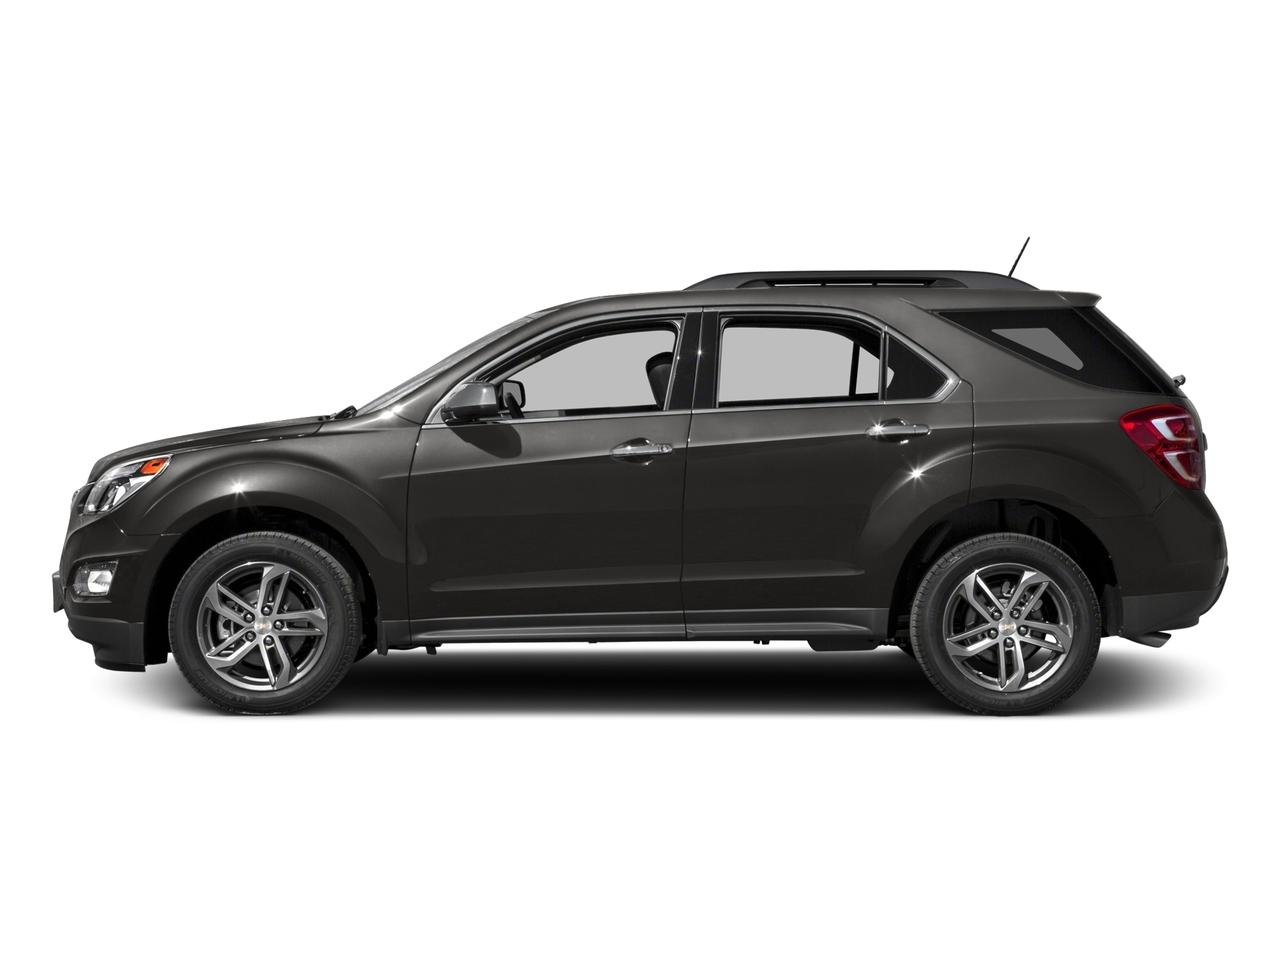 Used 2017 Chevrolet Equinox Premier with VIN 2GNFLGEK8H6178012 for sale in Park Rapids, Minnesota